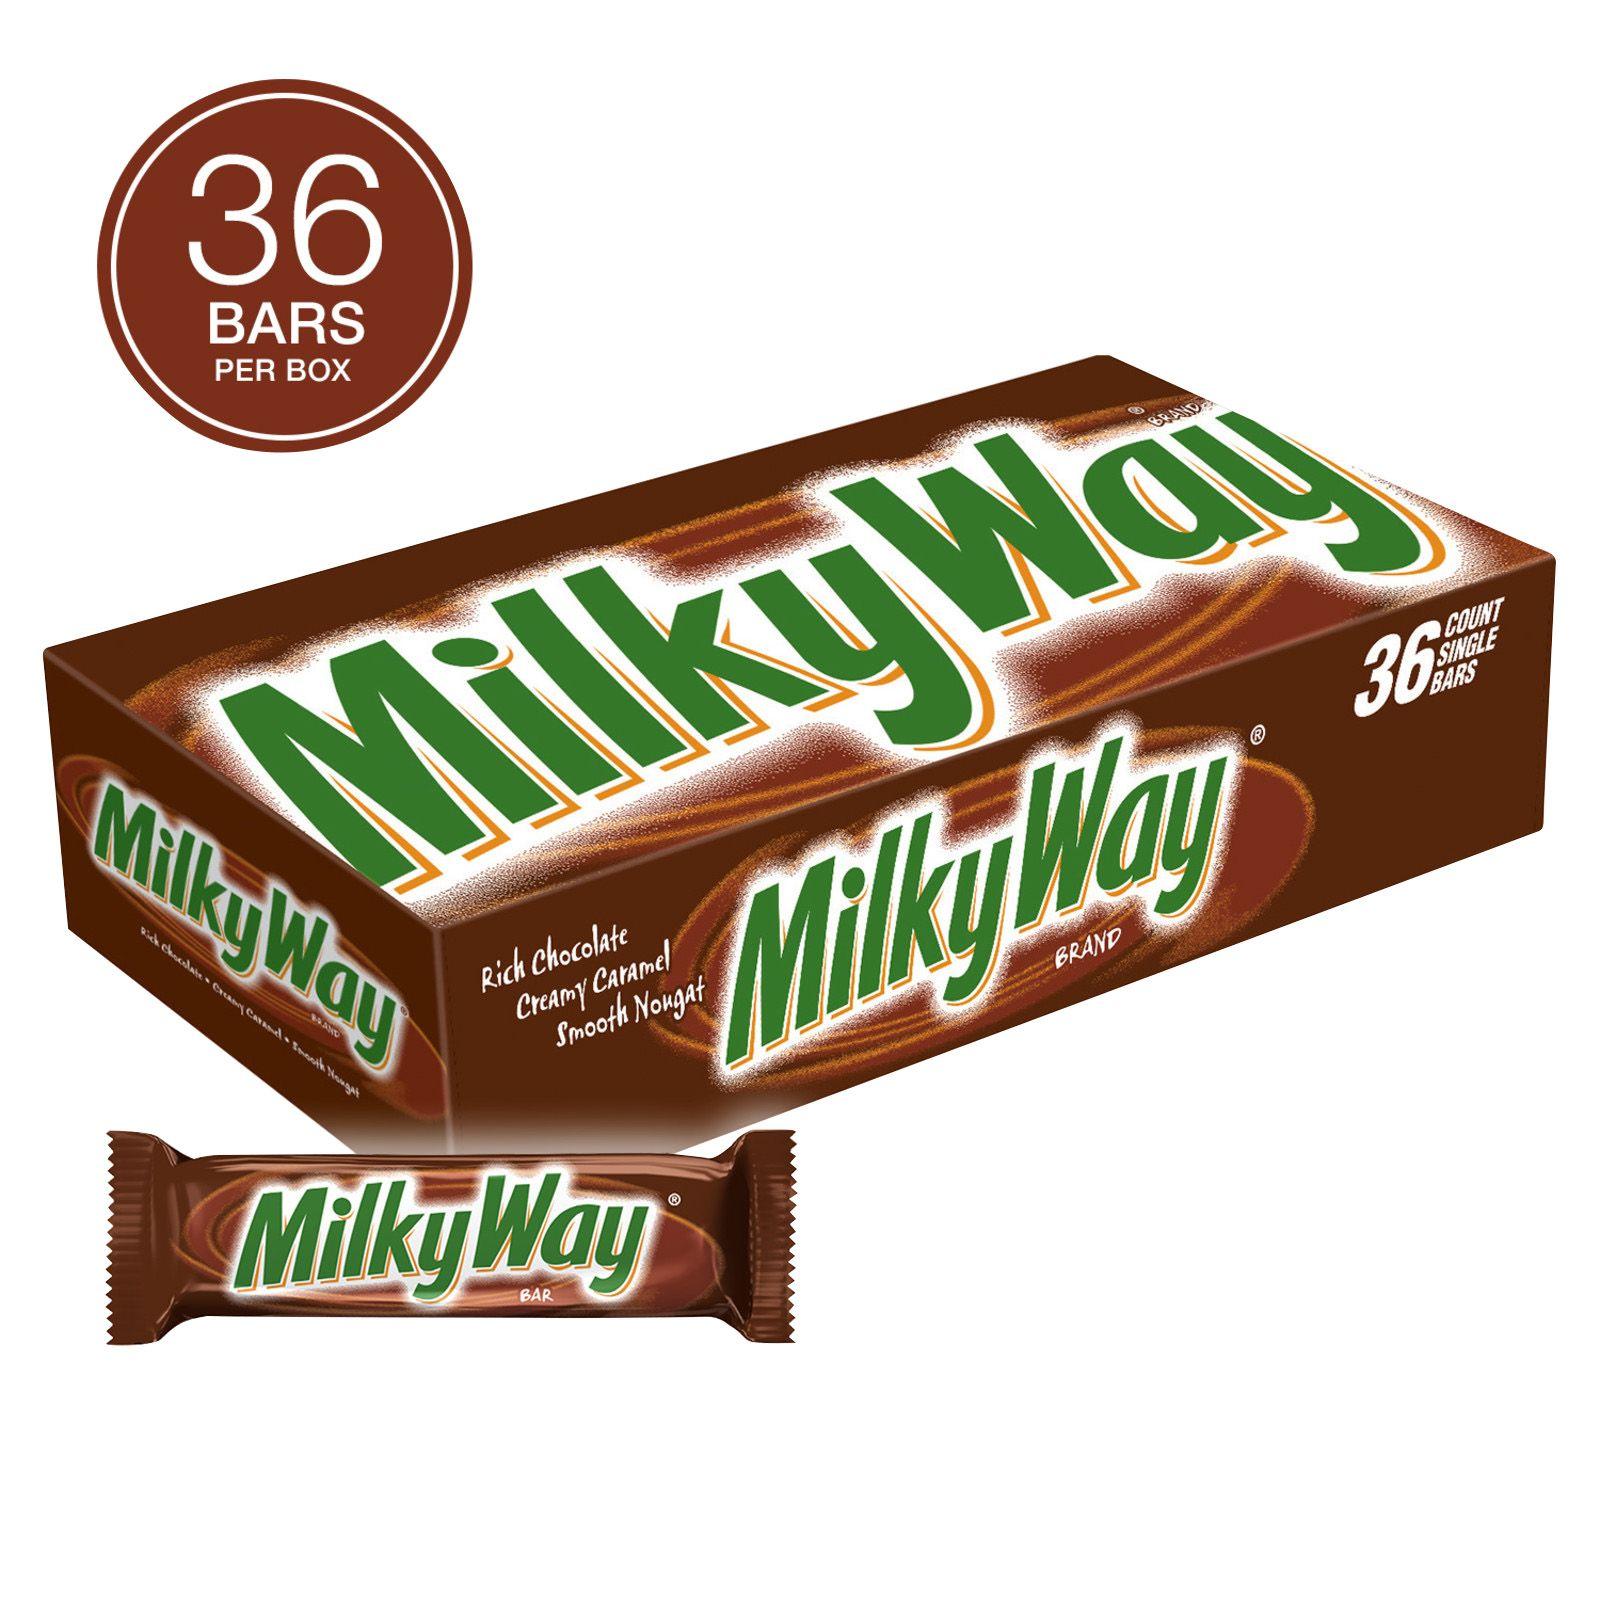 Milky Way Milk Chocolate Candy Bars, Full Size Bulk Pack, 1.84 oz, 36 ct